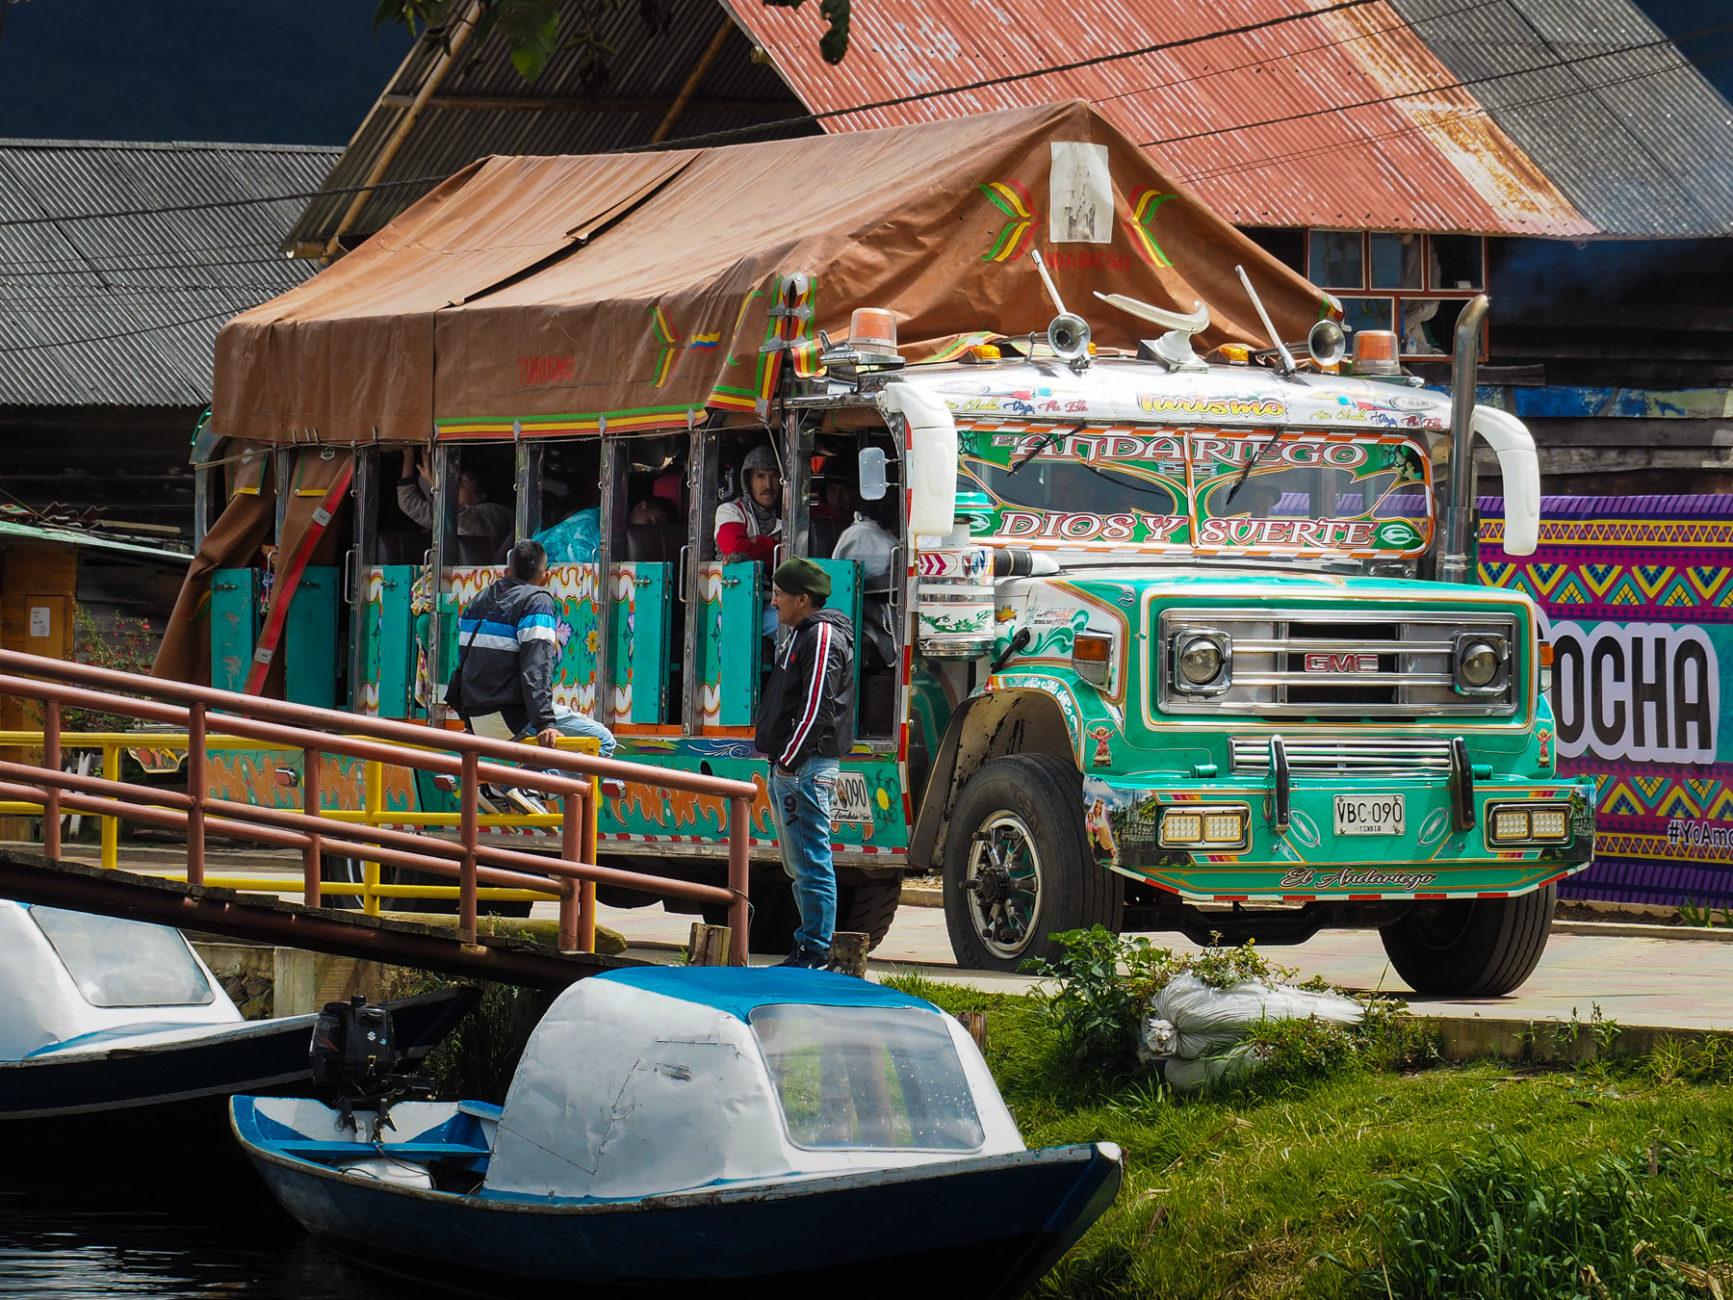 Chivas heißen diese bunten Busse in Kolumbien